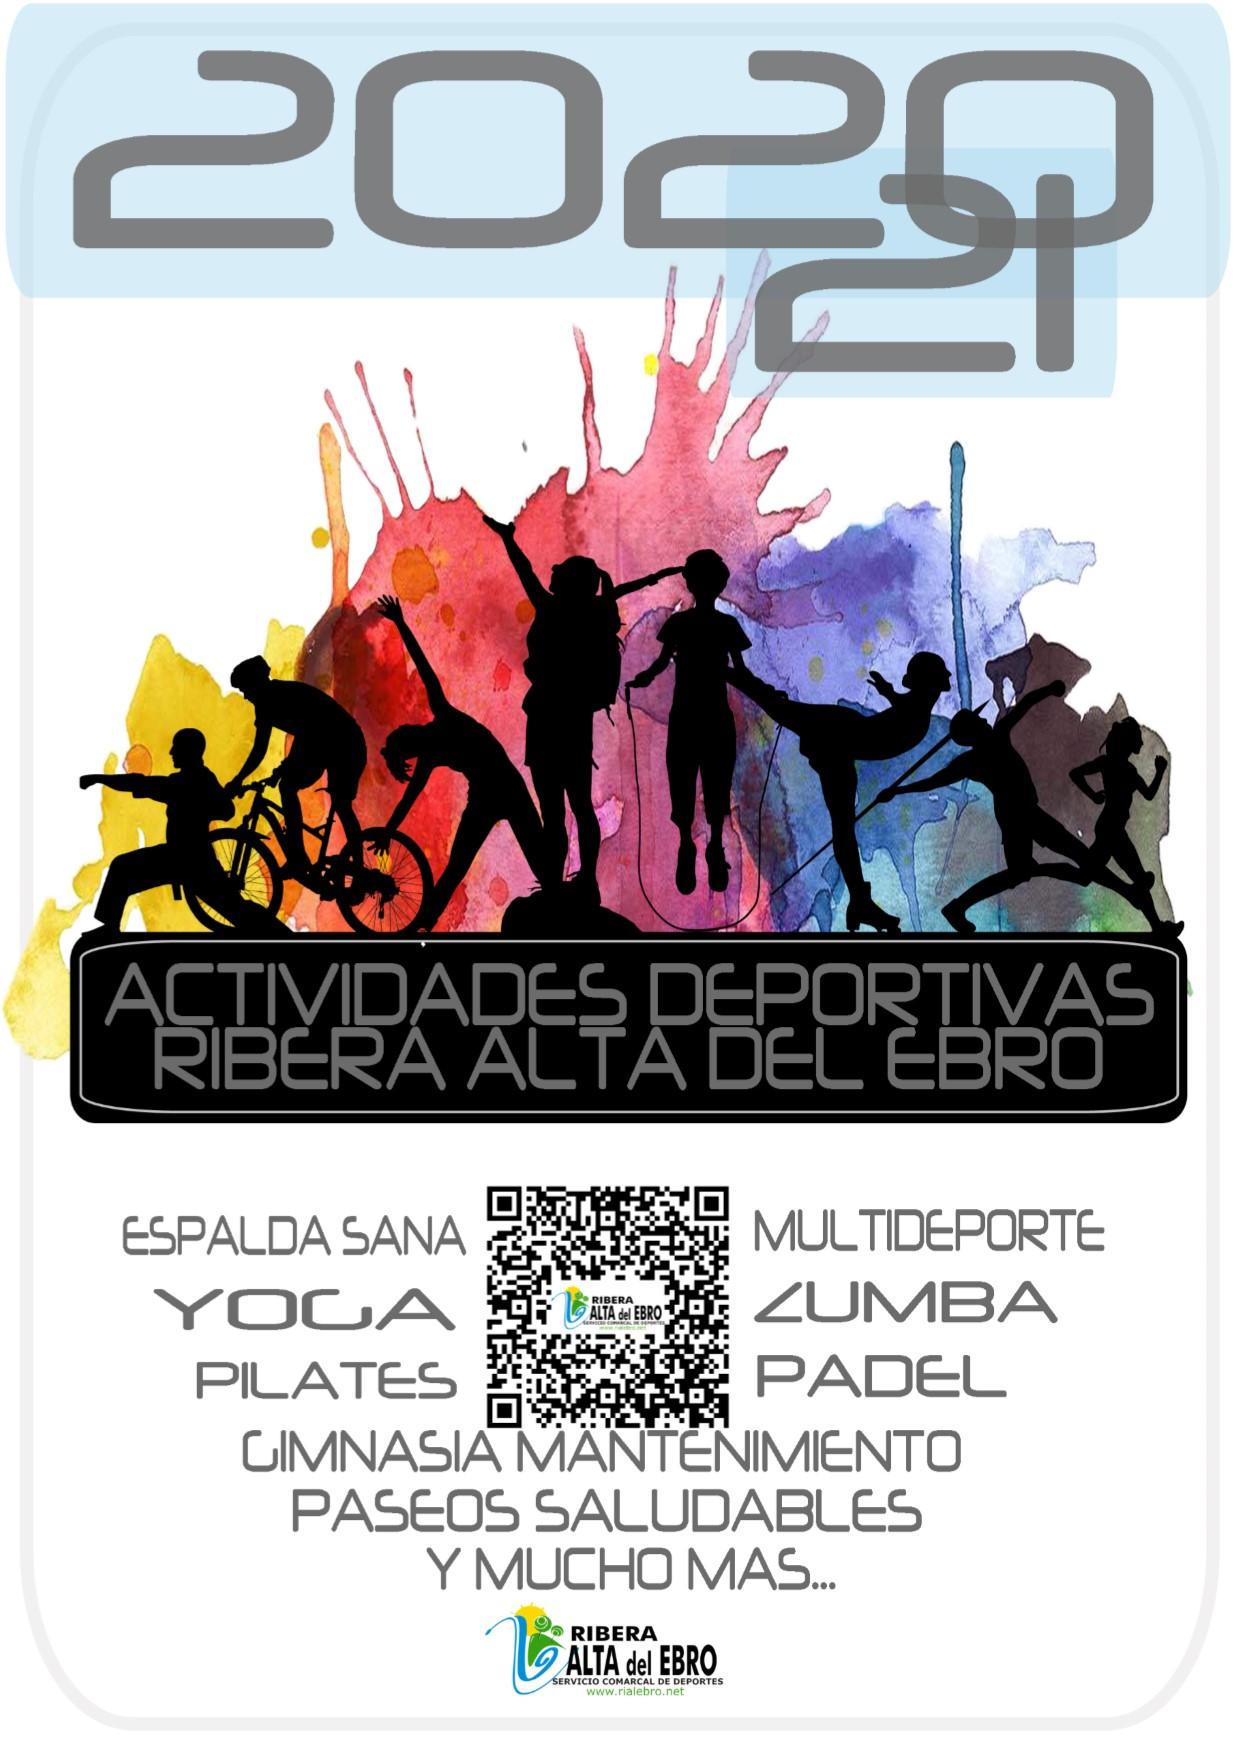 ACTIVIDADES DEPORTIVAS CURSO 2020/2021